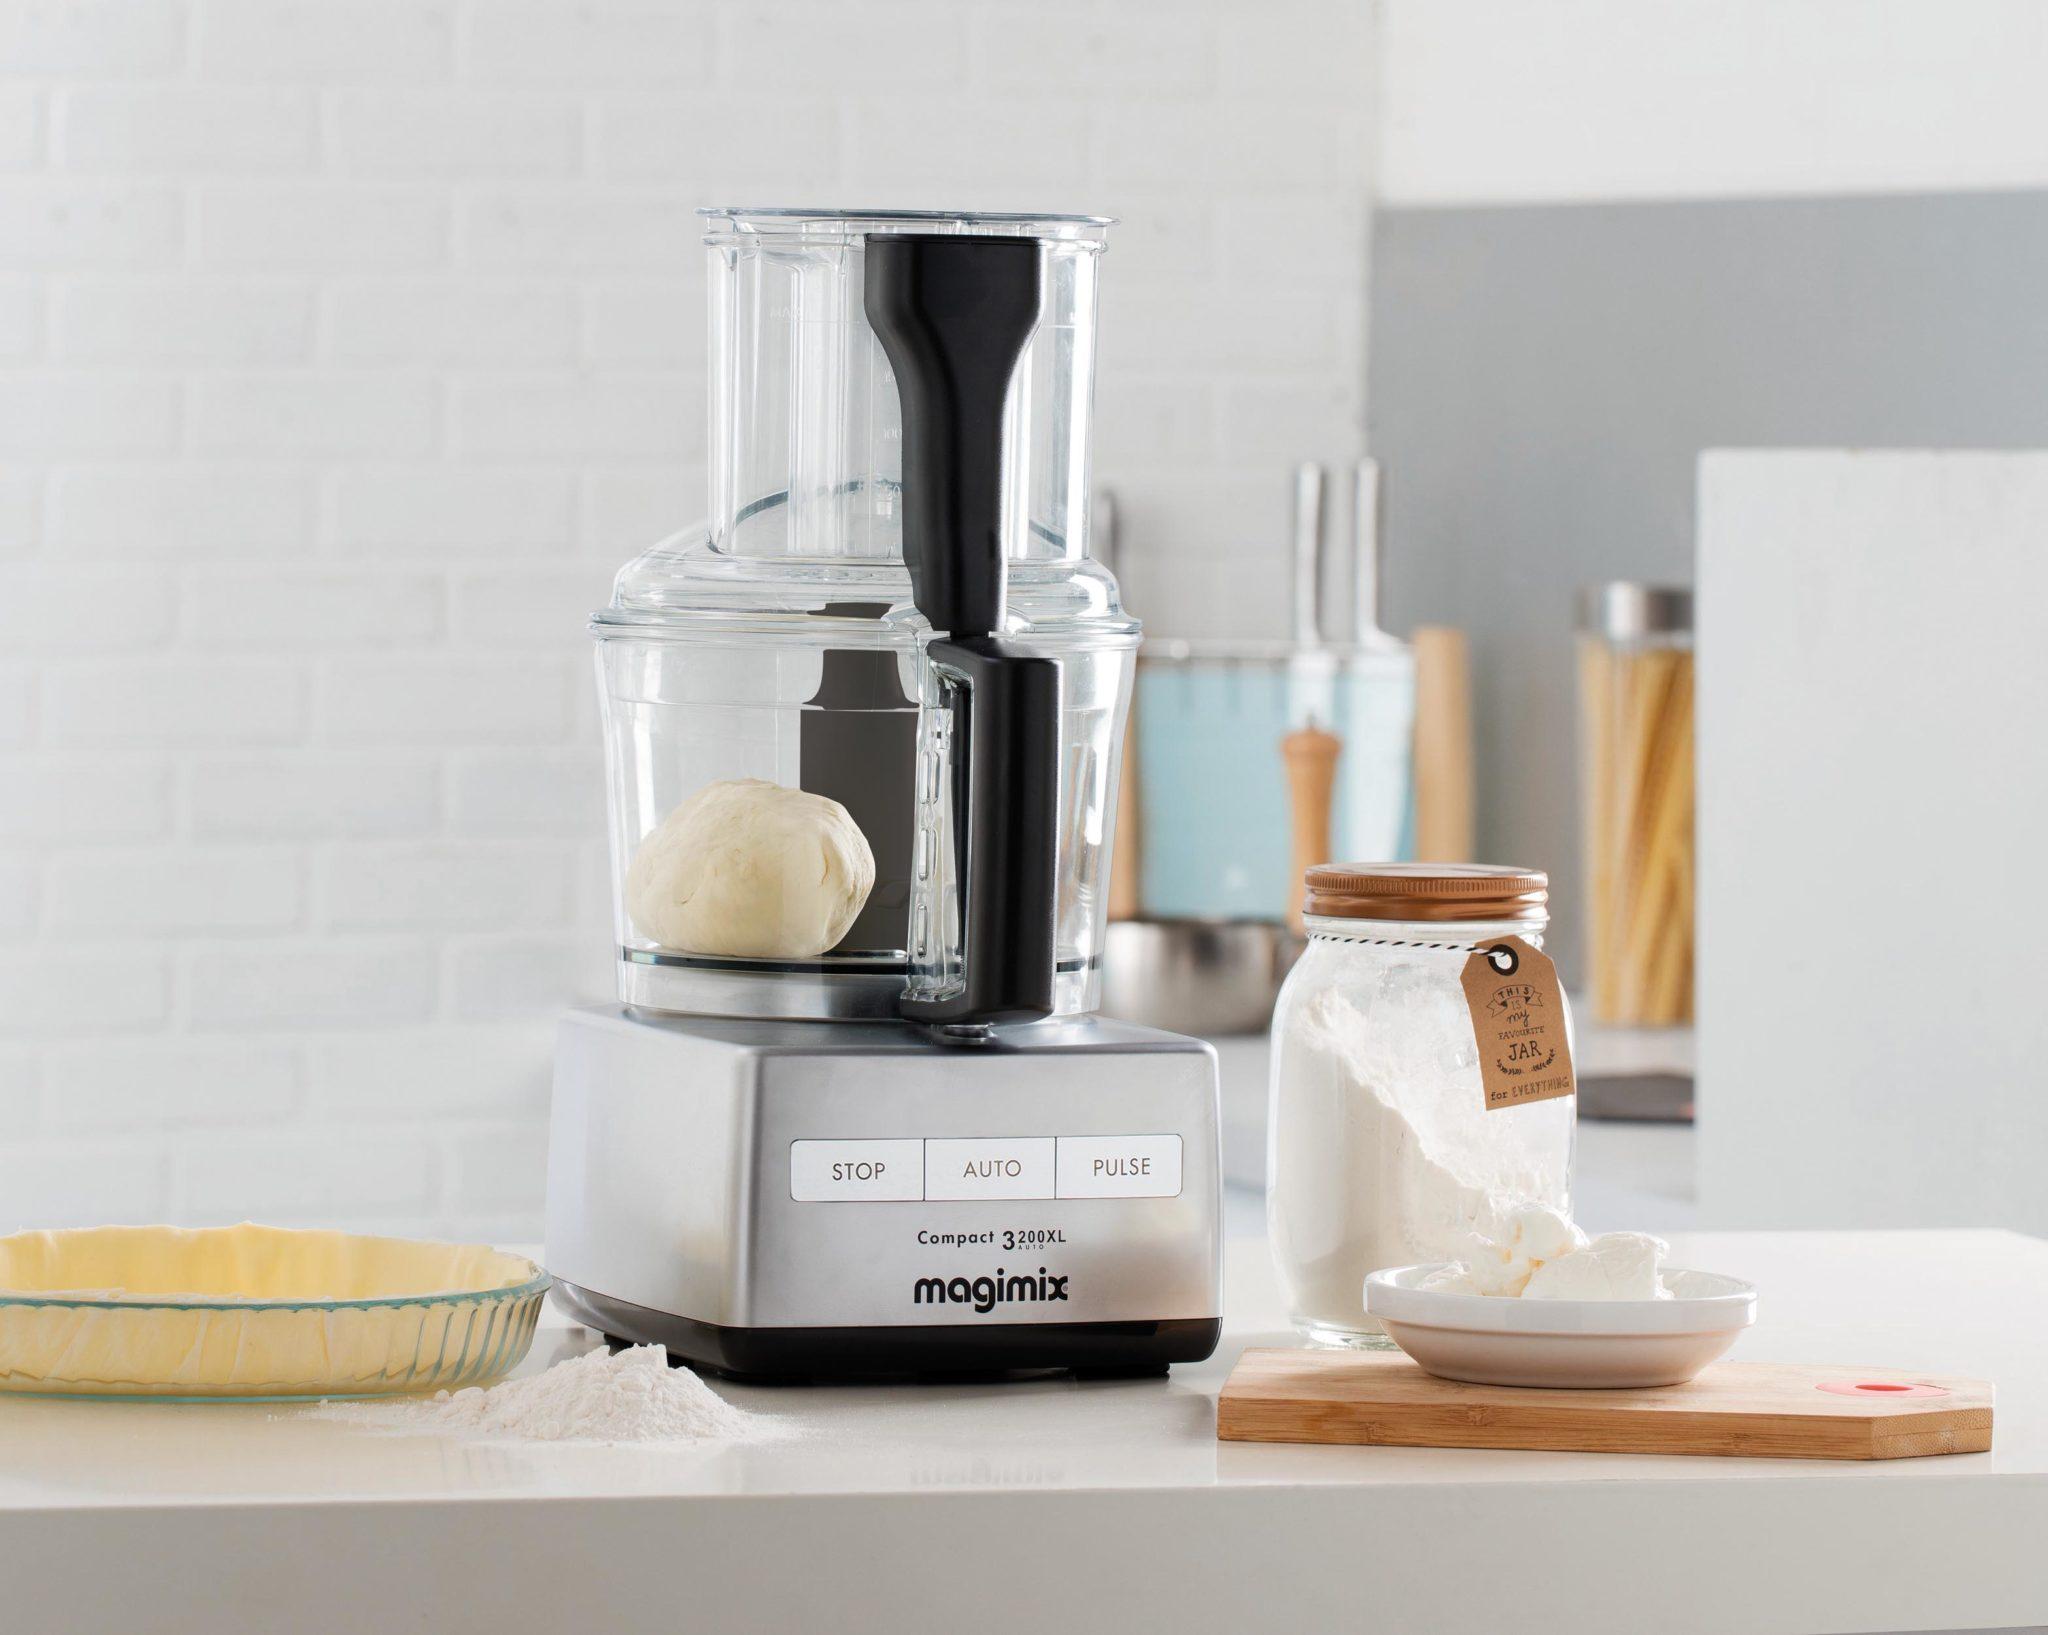 magimix robot da cucina compact 3200xl